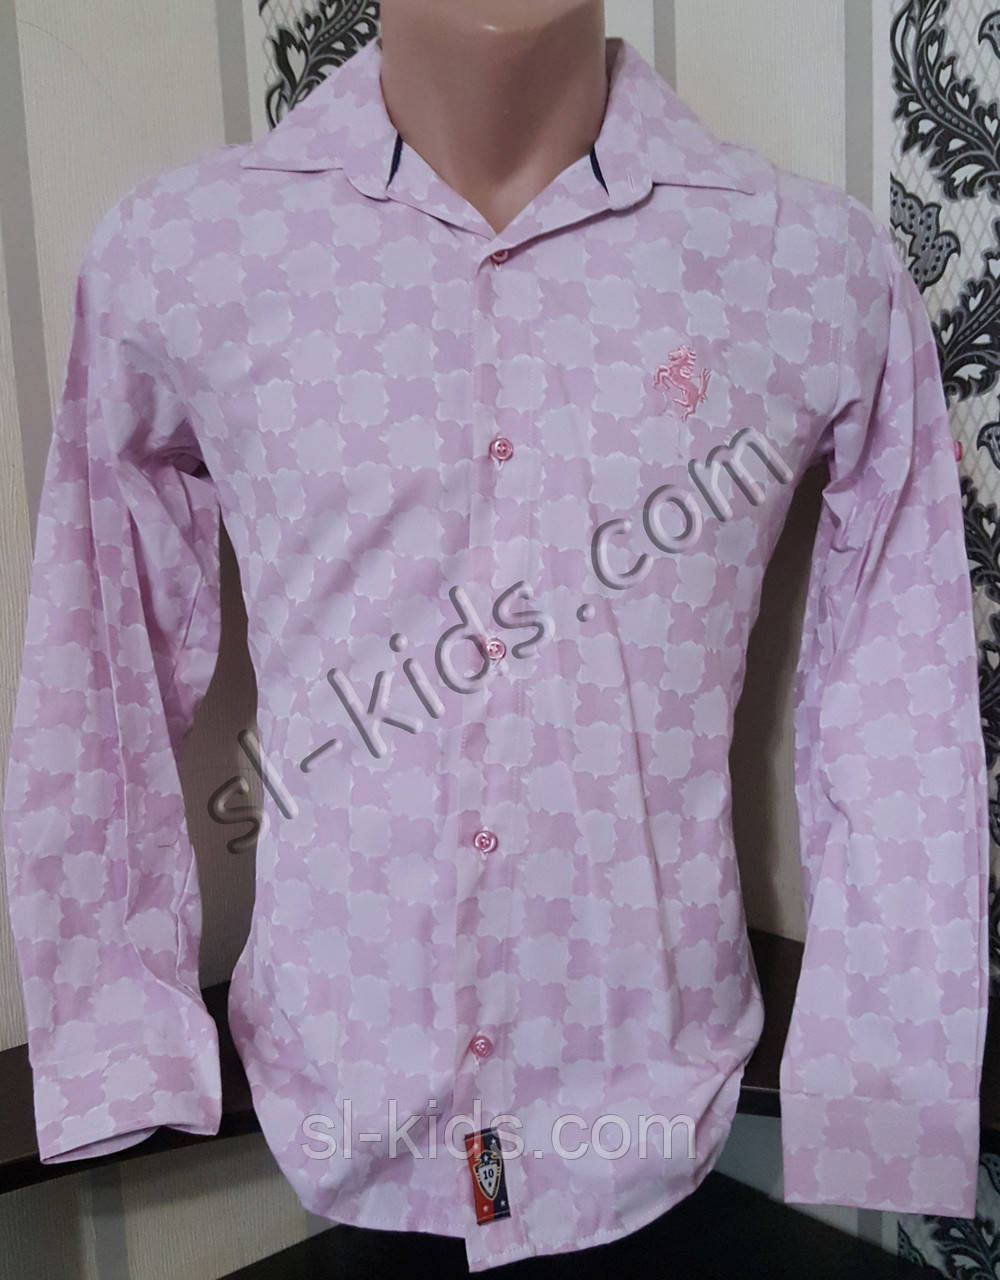 Стильна х/б сорочка для хлопчика 128-158 см (опт) (пр. Туреччина)